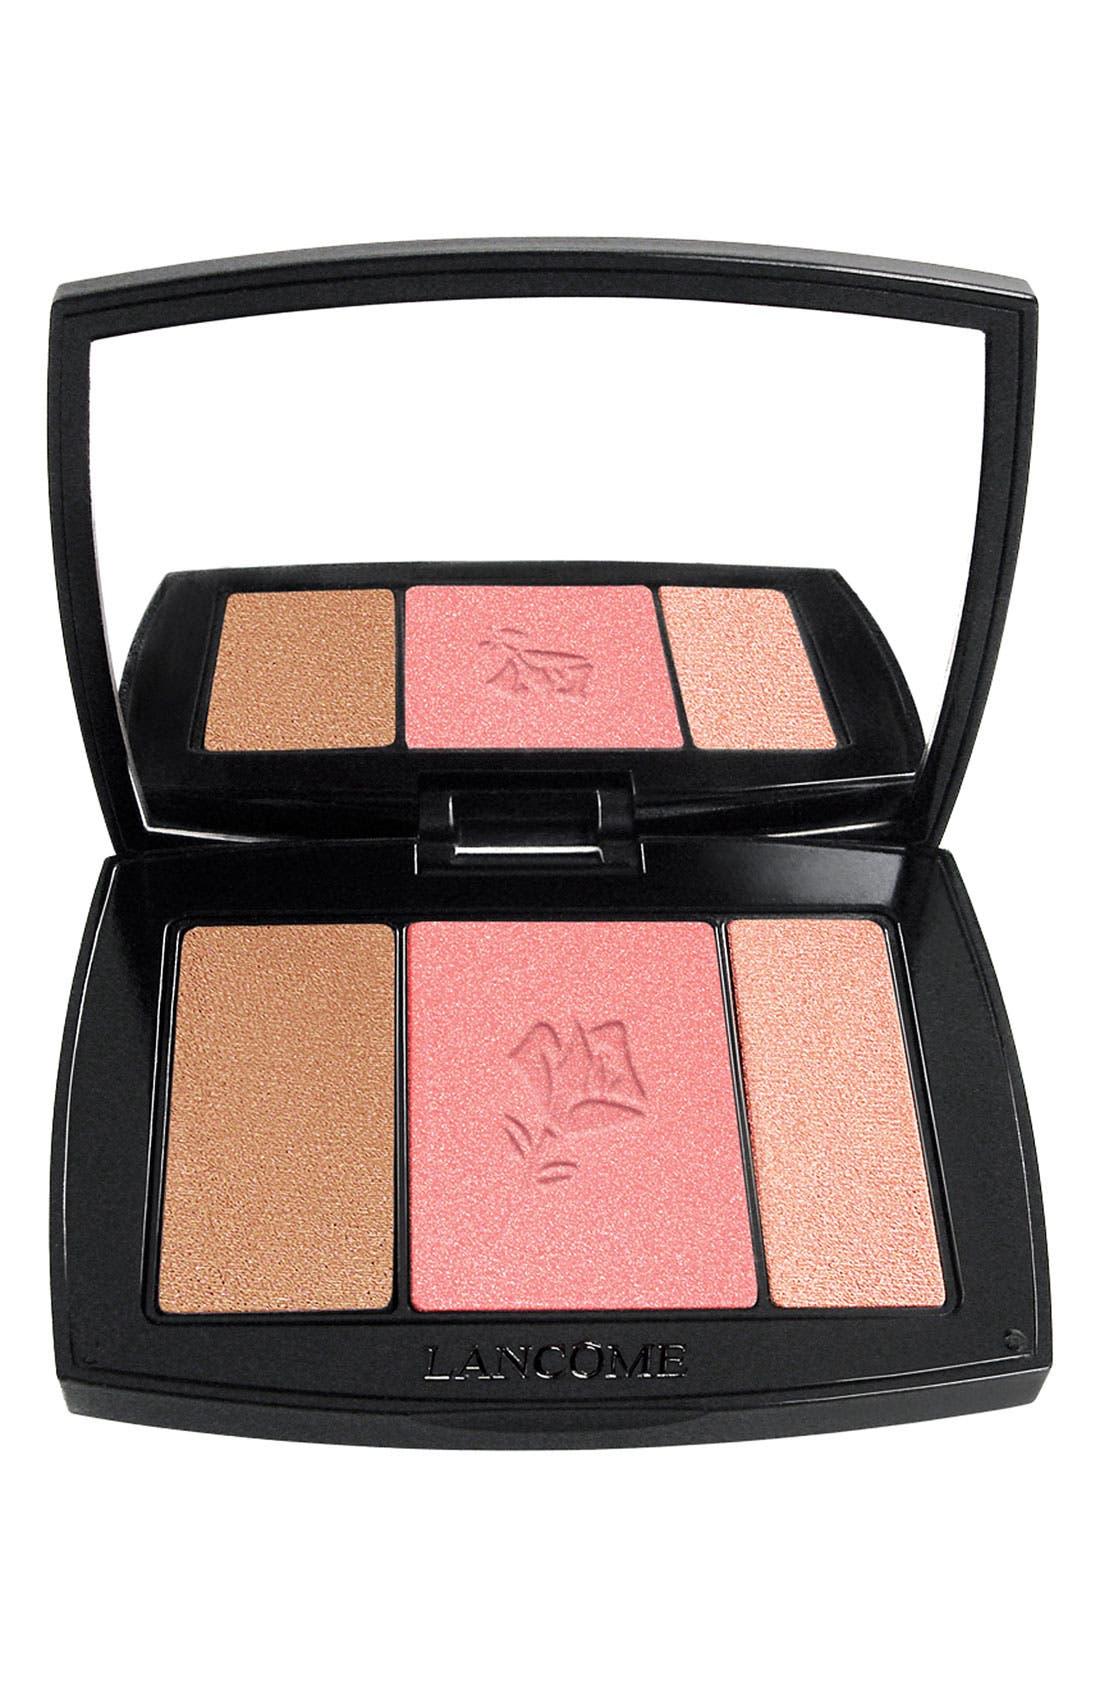 Blush Subtil All-In-One Contour, Blush & Highlighter Palette,                             Main thumbnail 1, color,                             323 ROSE FLUSH